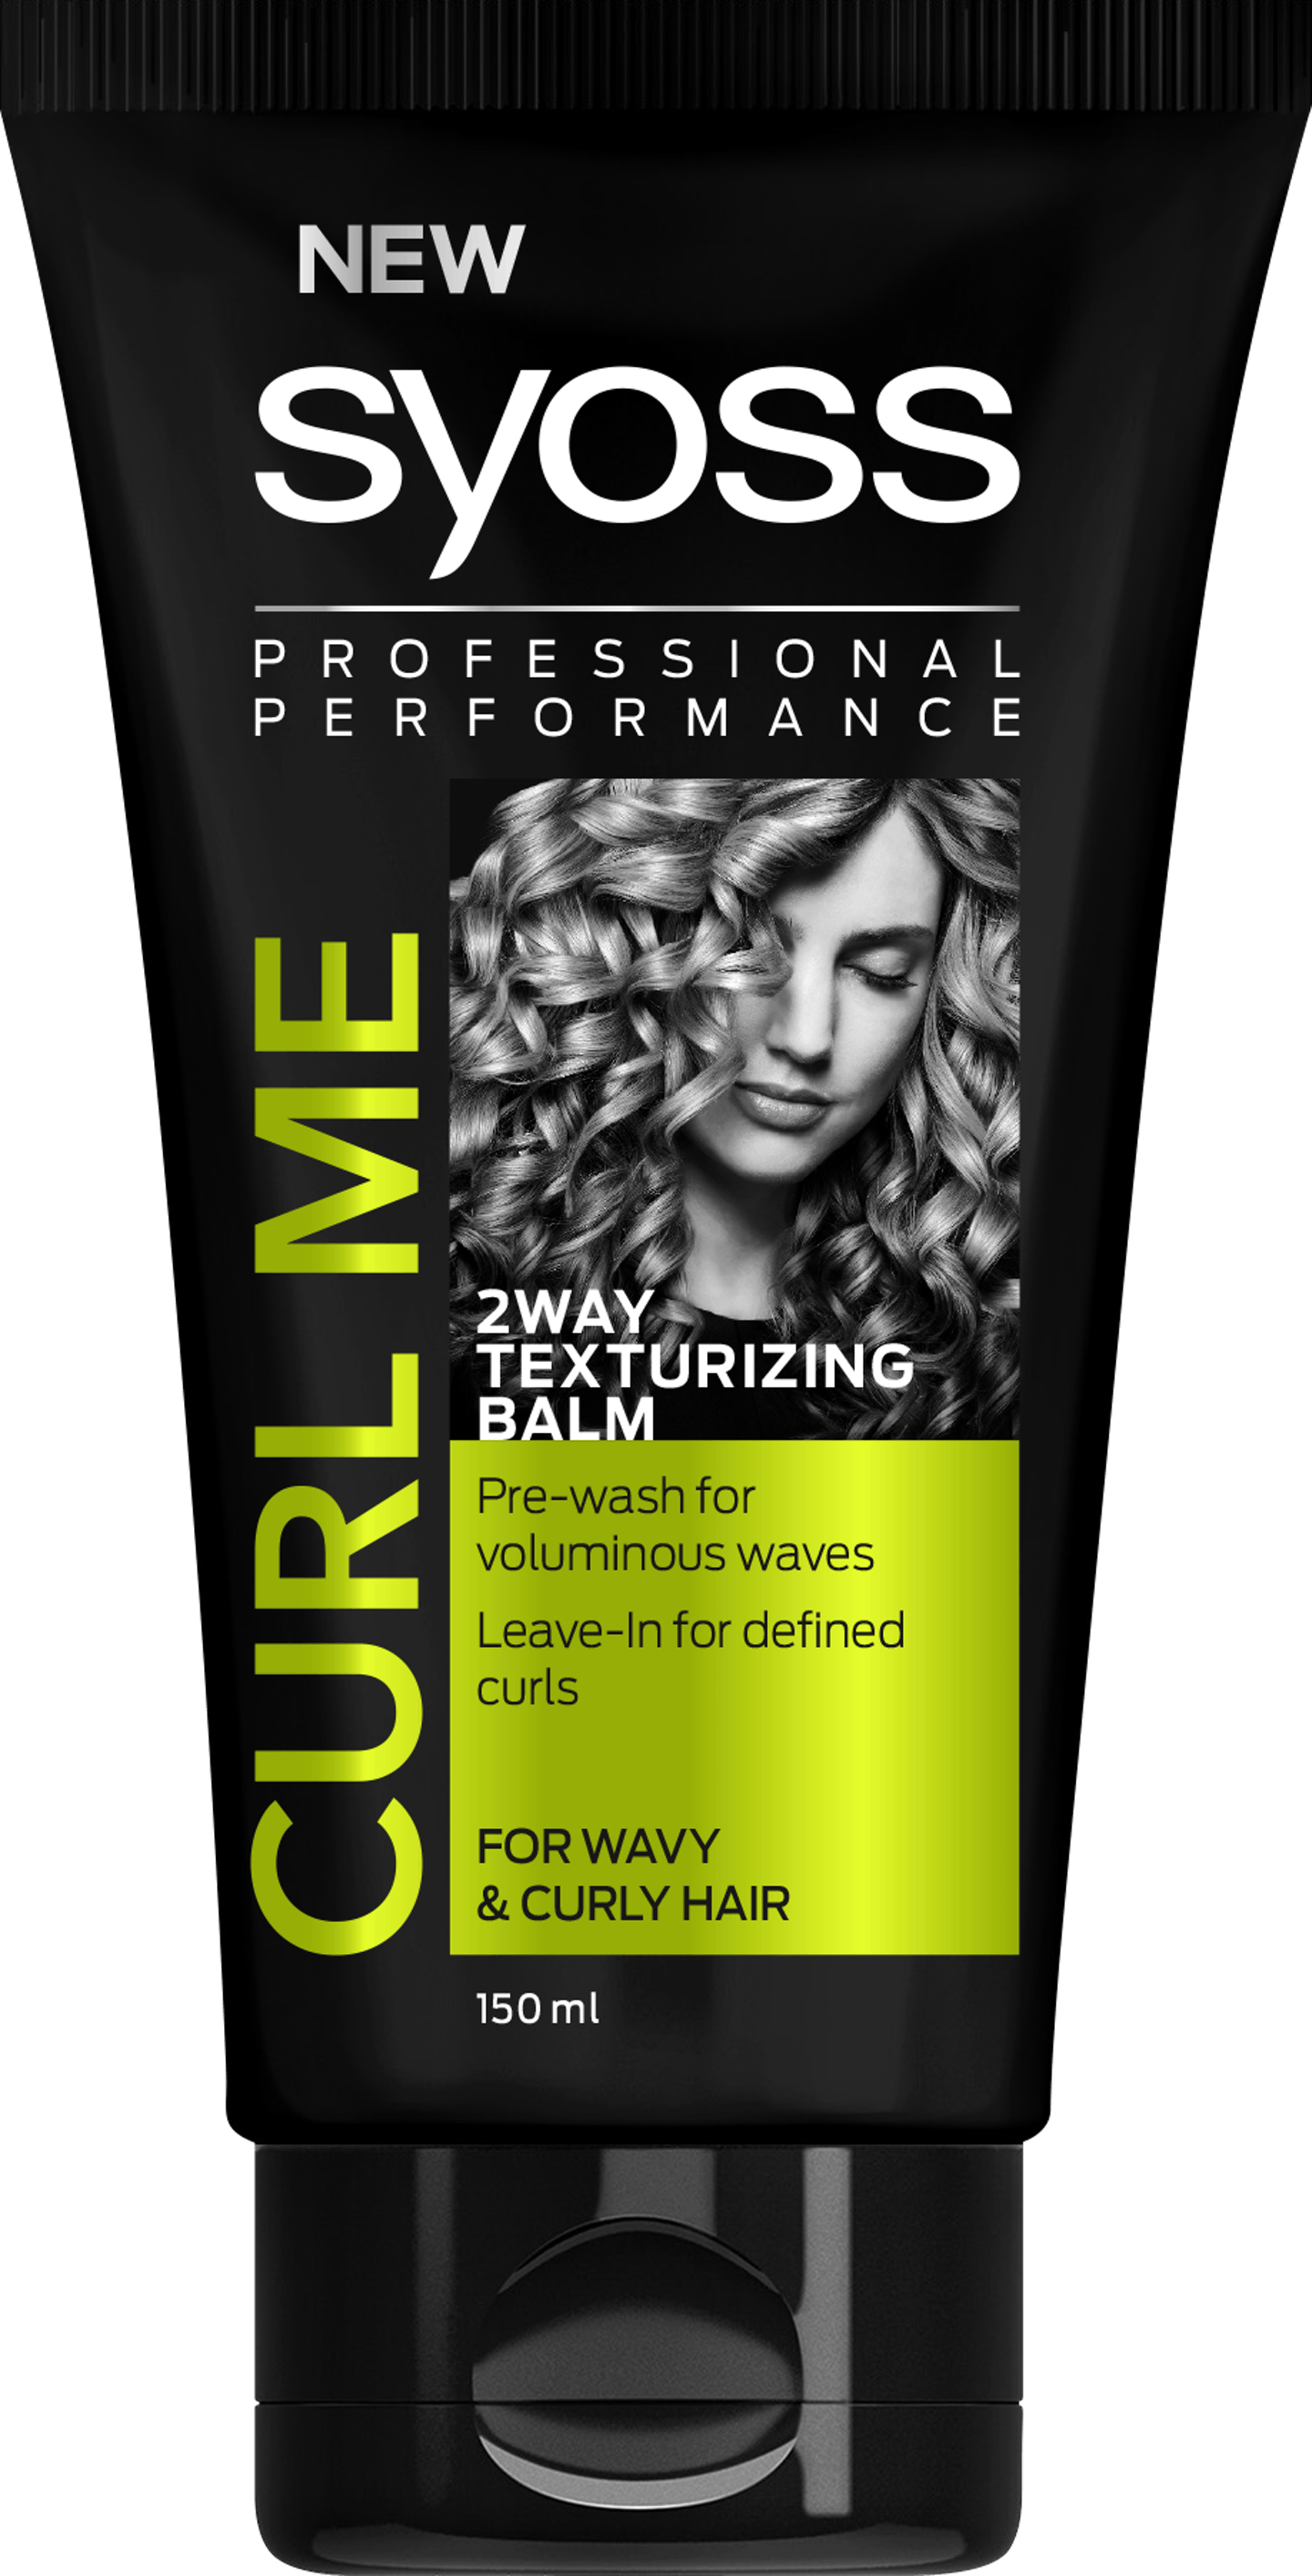 Syoss Curl Me 2 Way Texturizing Balm